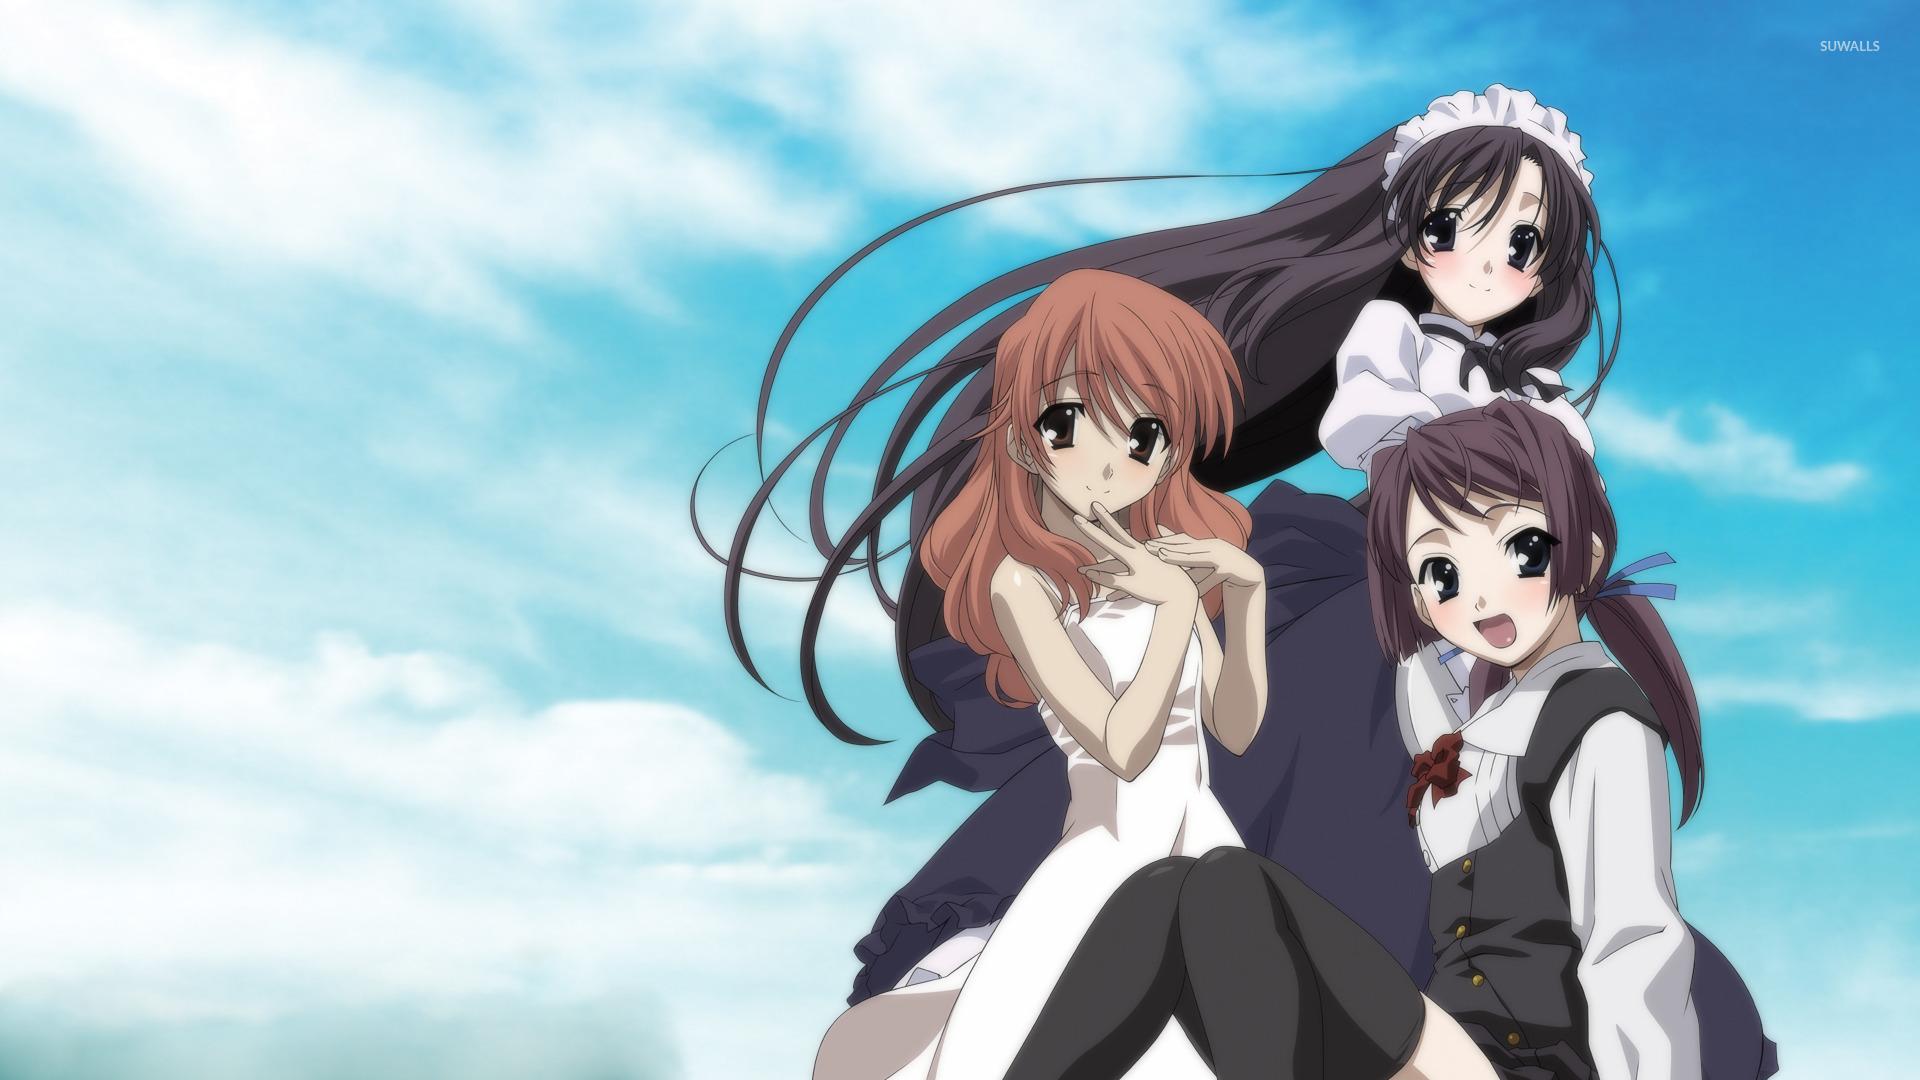 download School Days wallpaper Anime wallpapers 33347 1920x1080